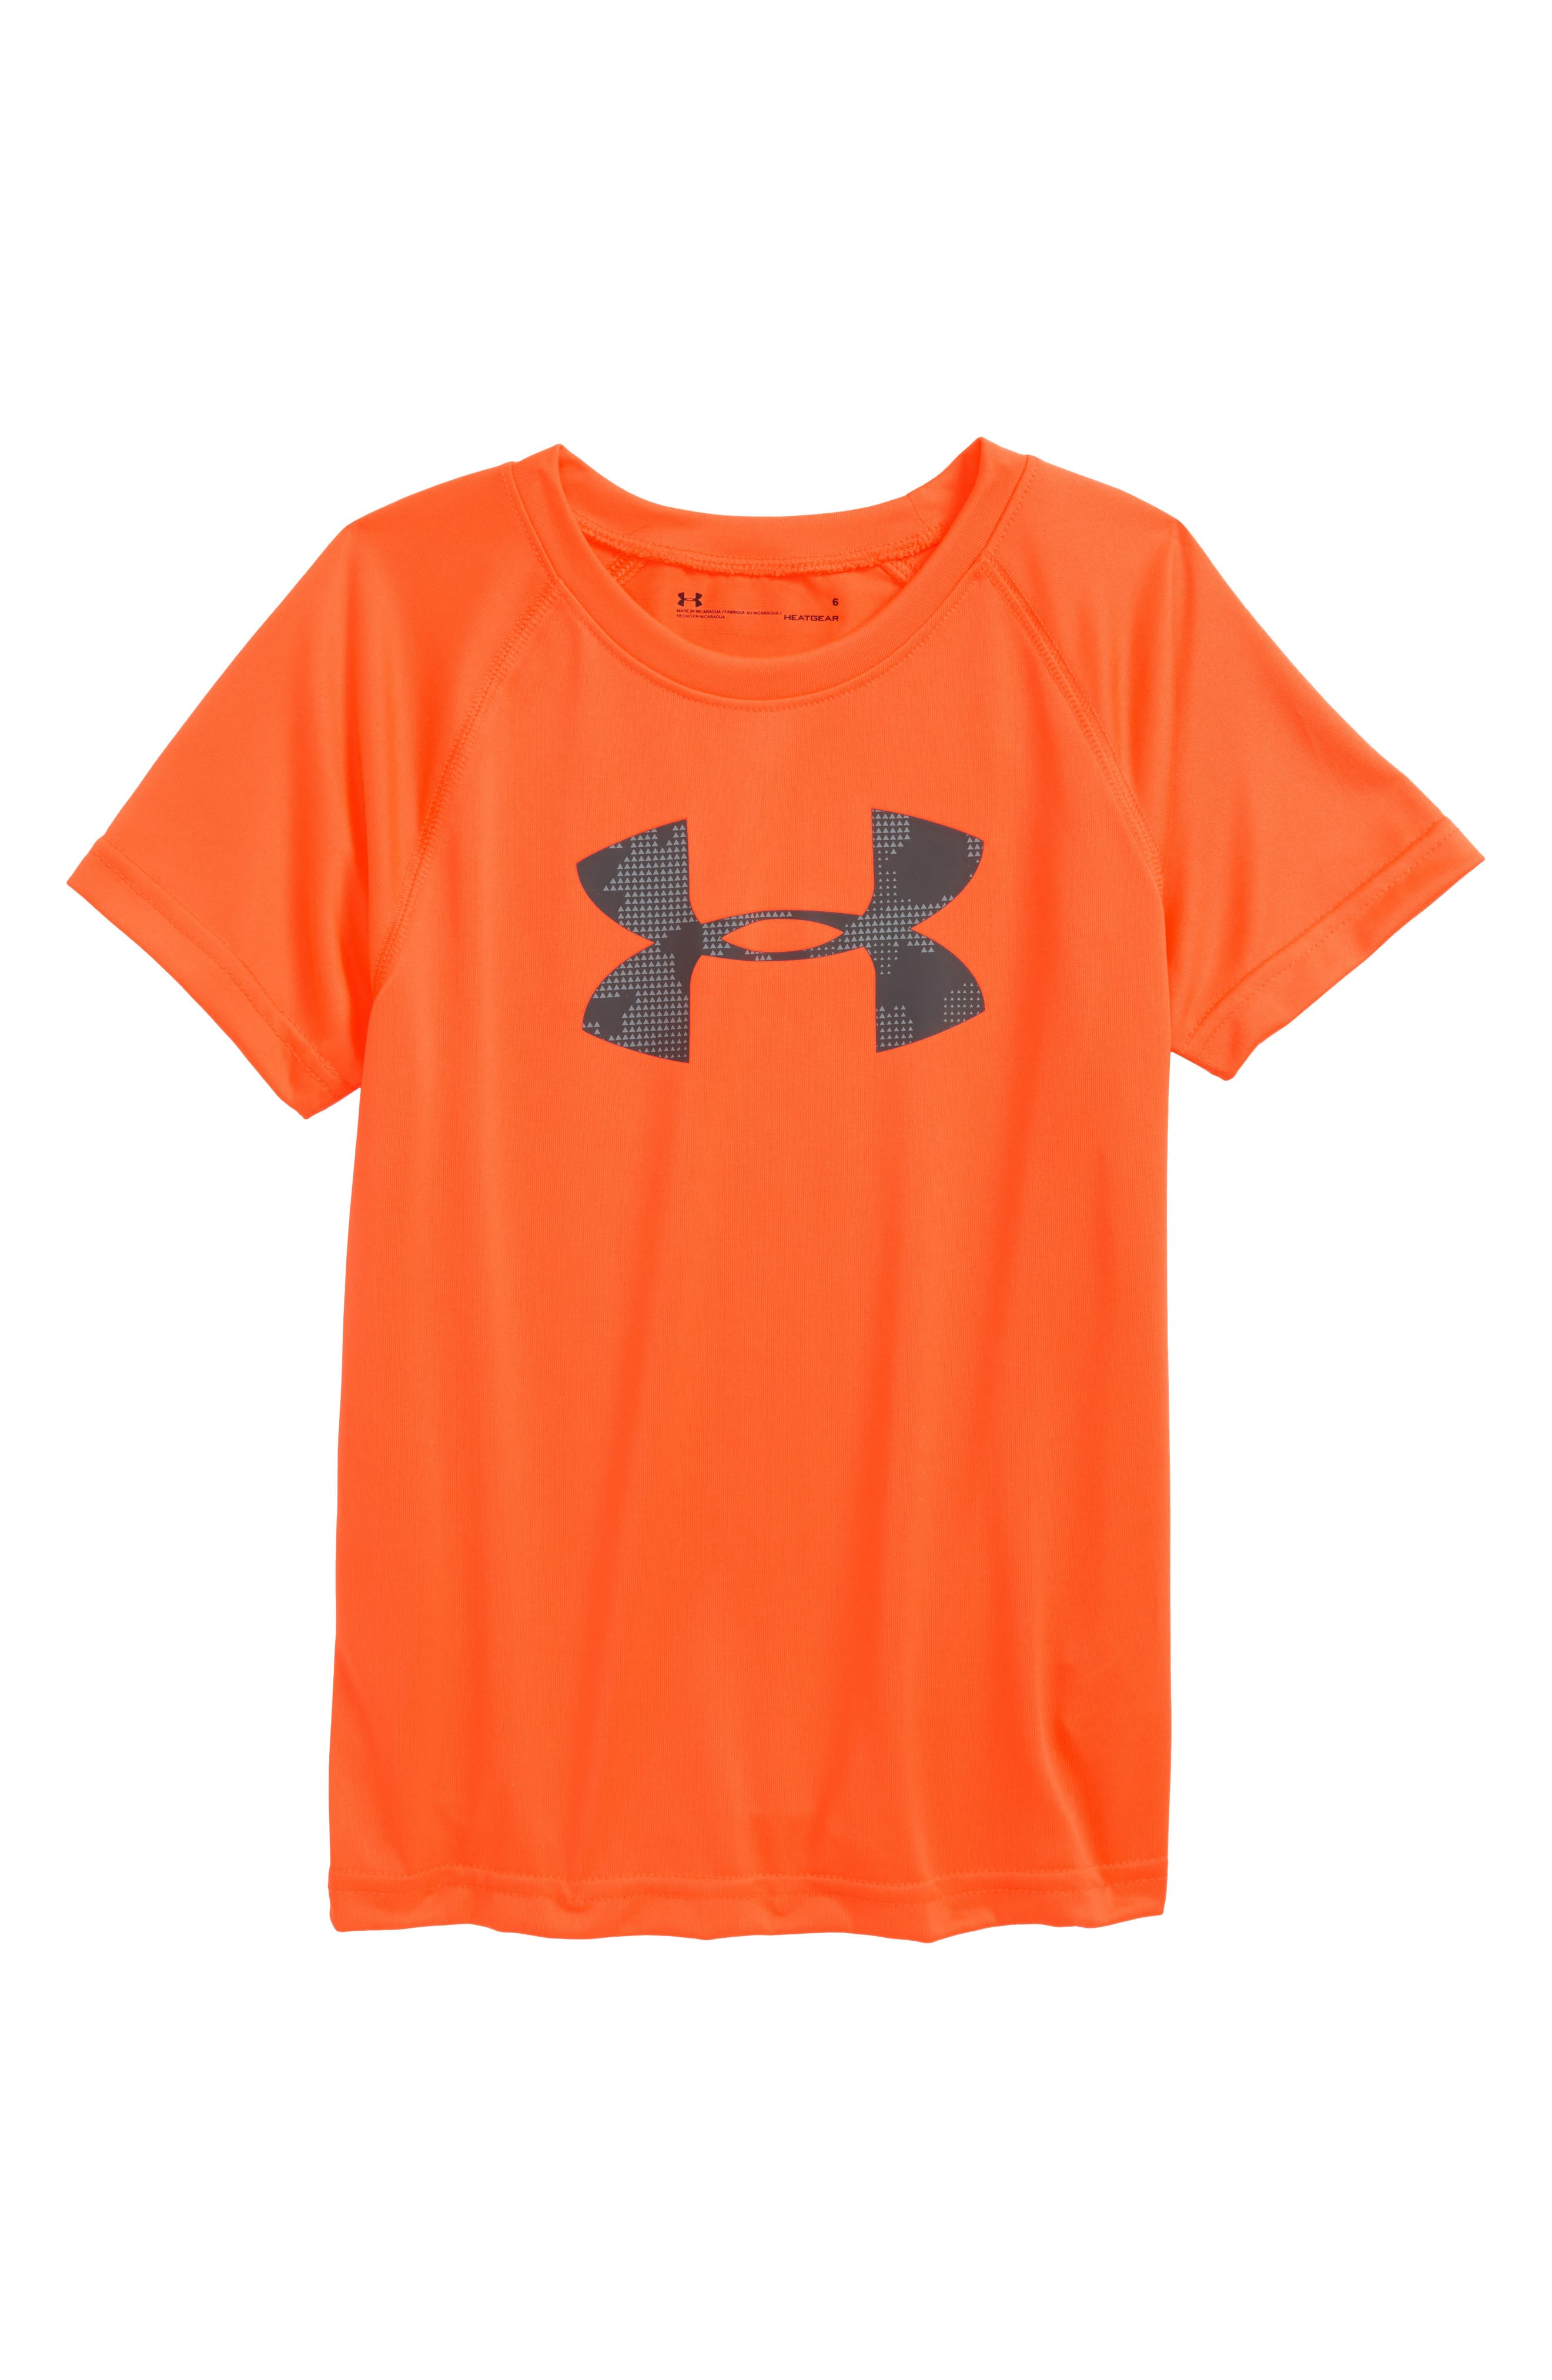 Main Image - Under Armour Utility Big Logo HeatGear® T-Shirt (Toddler Boys & Little Boys)